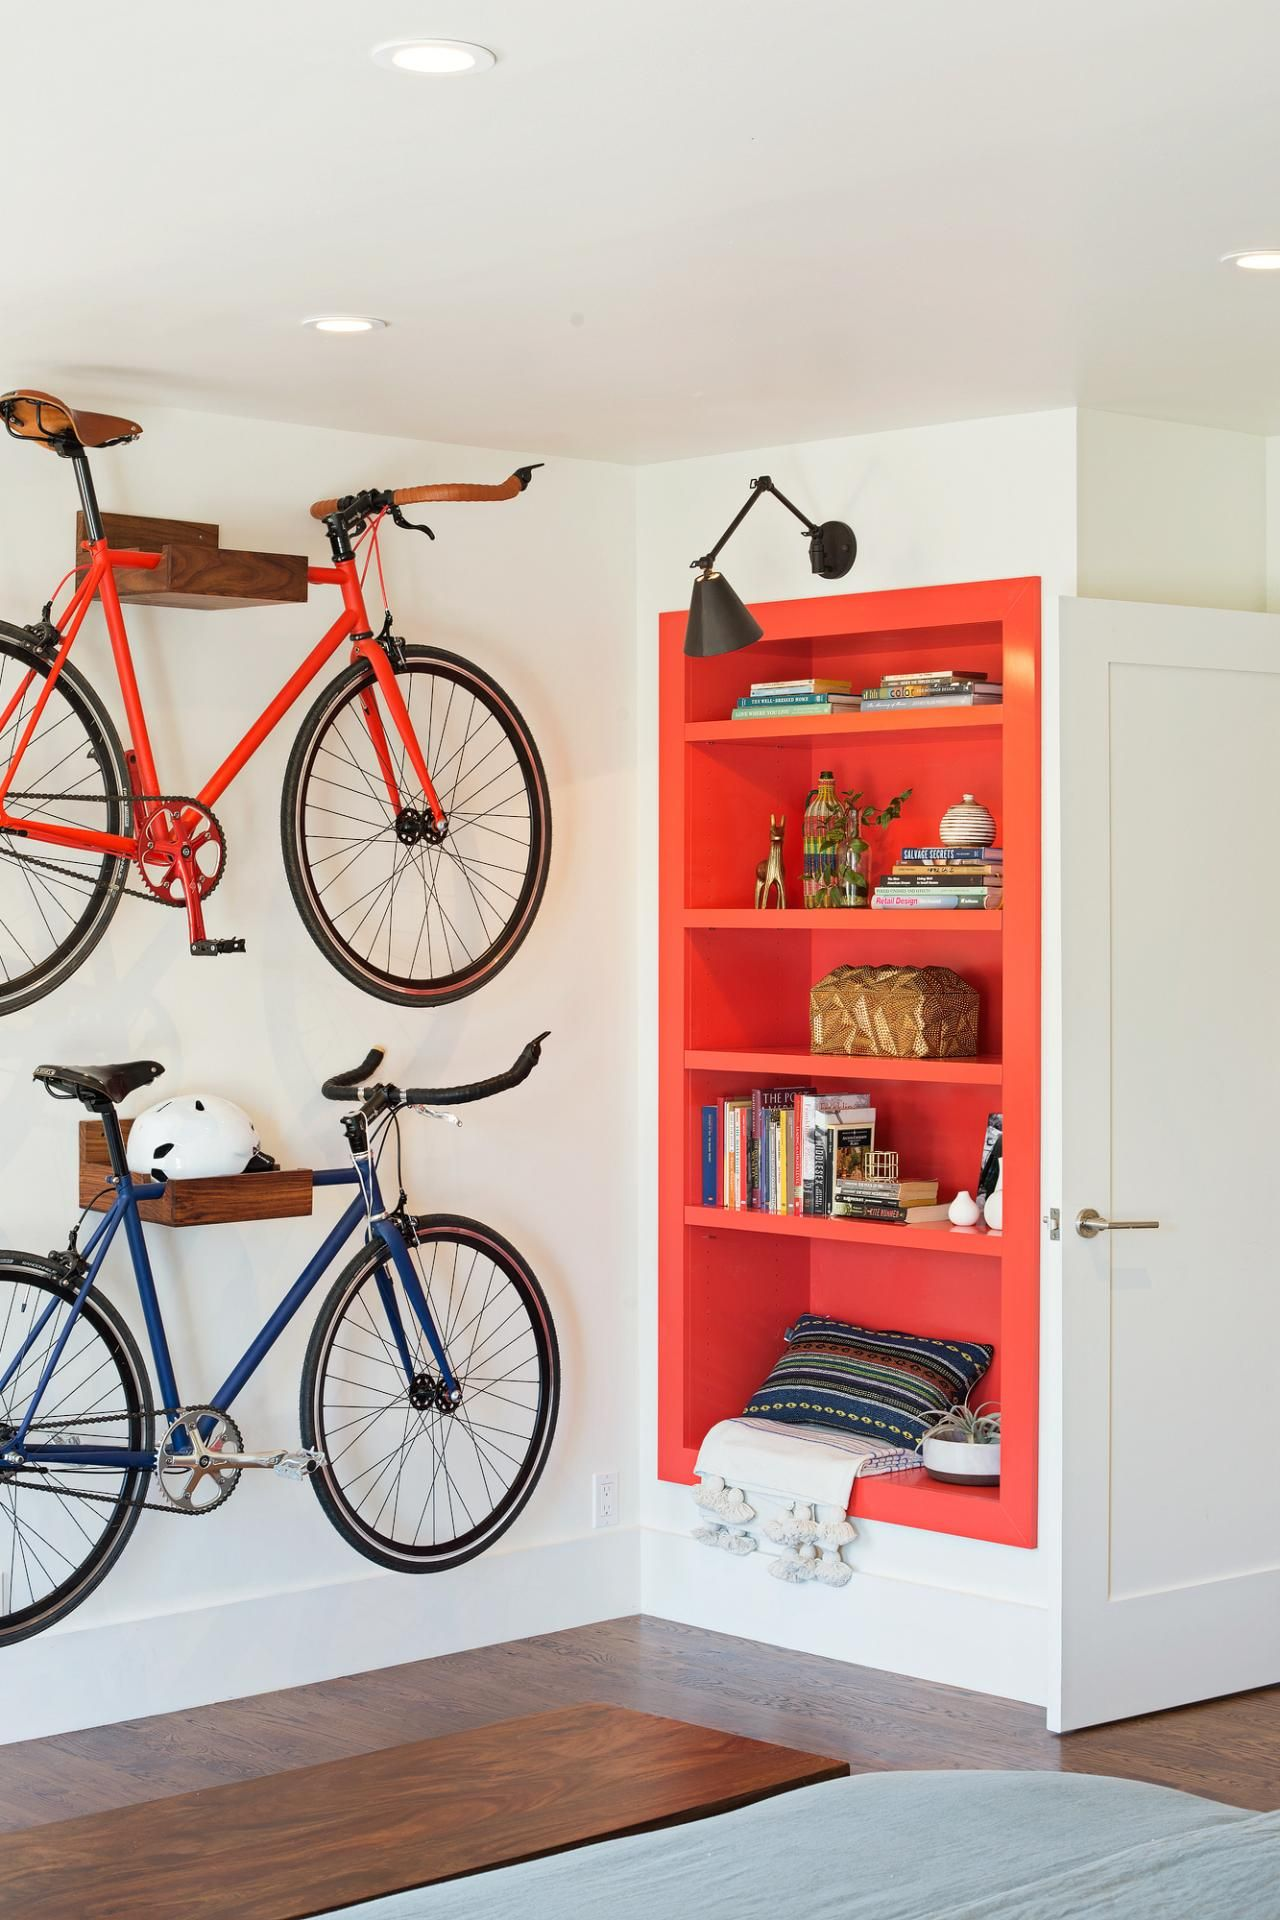 Wonderful Bedroom With Bike Storage Images